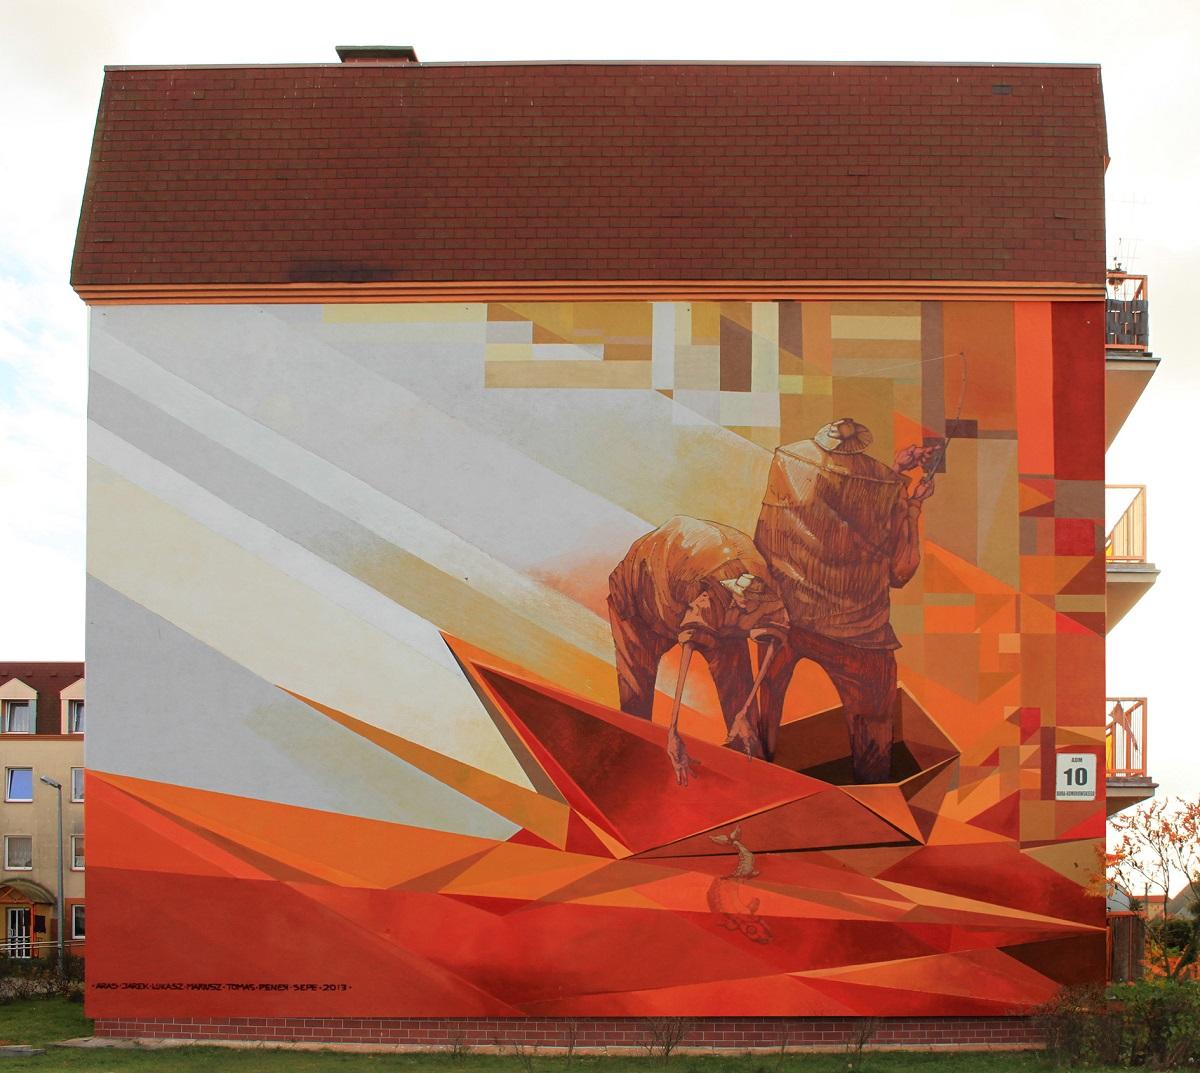 pener-sepe-new-mural-in-bydgoszcz-poland-06